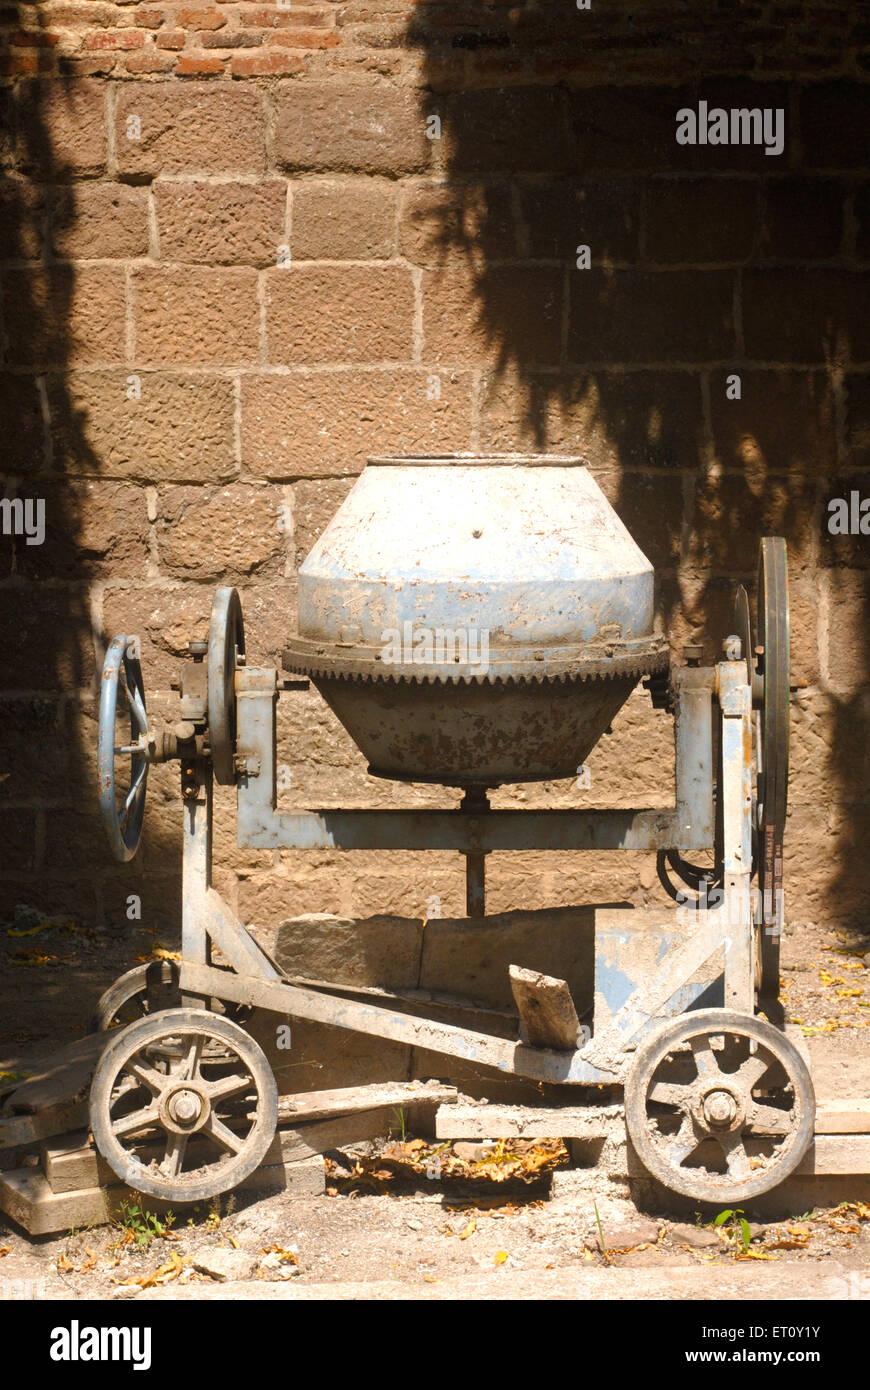 Batidora de mano pequeña de cemento Pune ; ; ; Maharashtra India Foto de stock